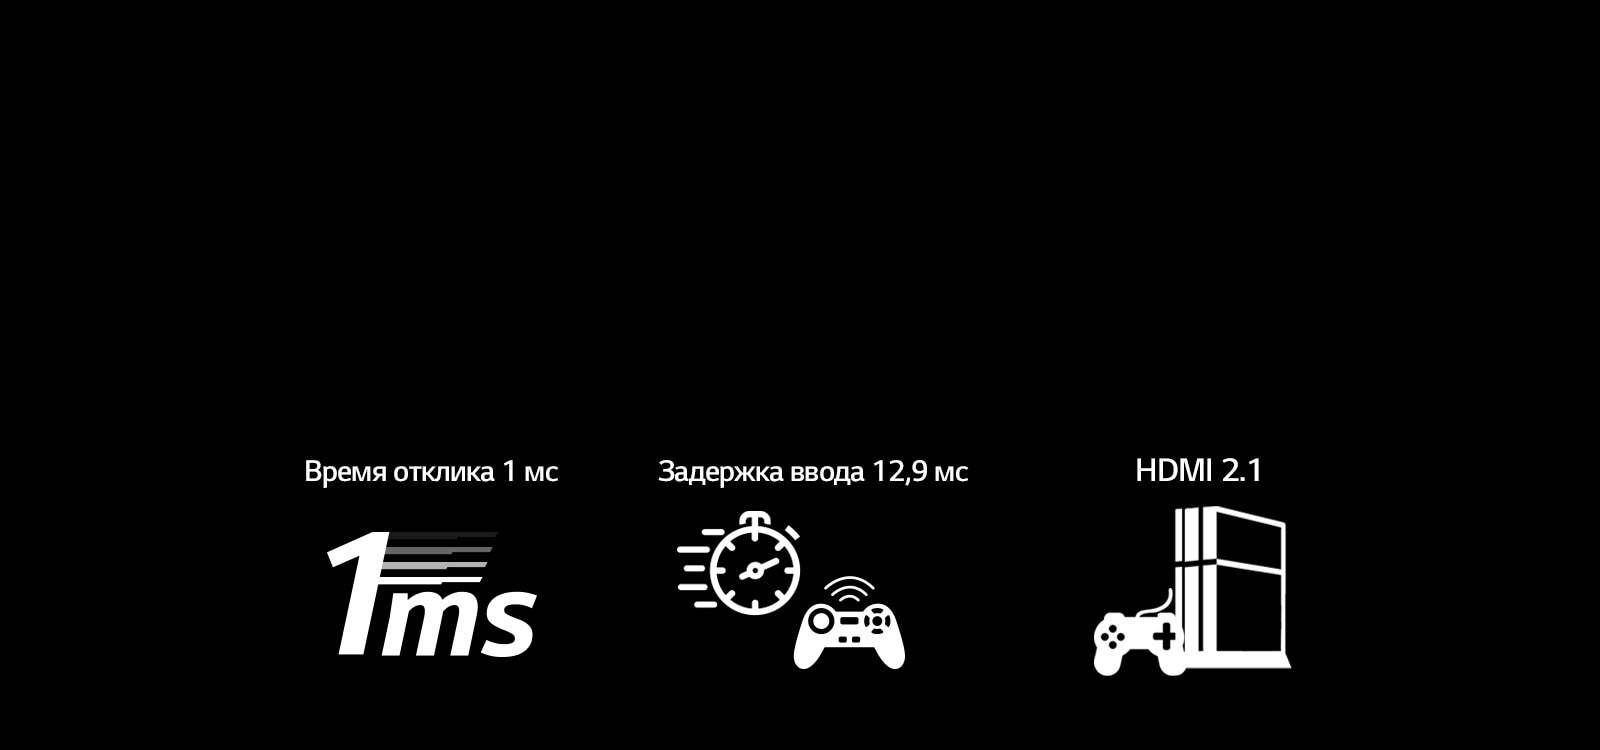 TV-OLED-C9-Gaming-2-Desktop